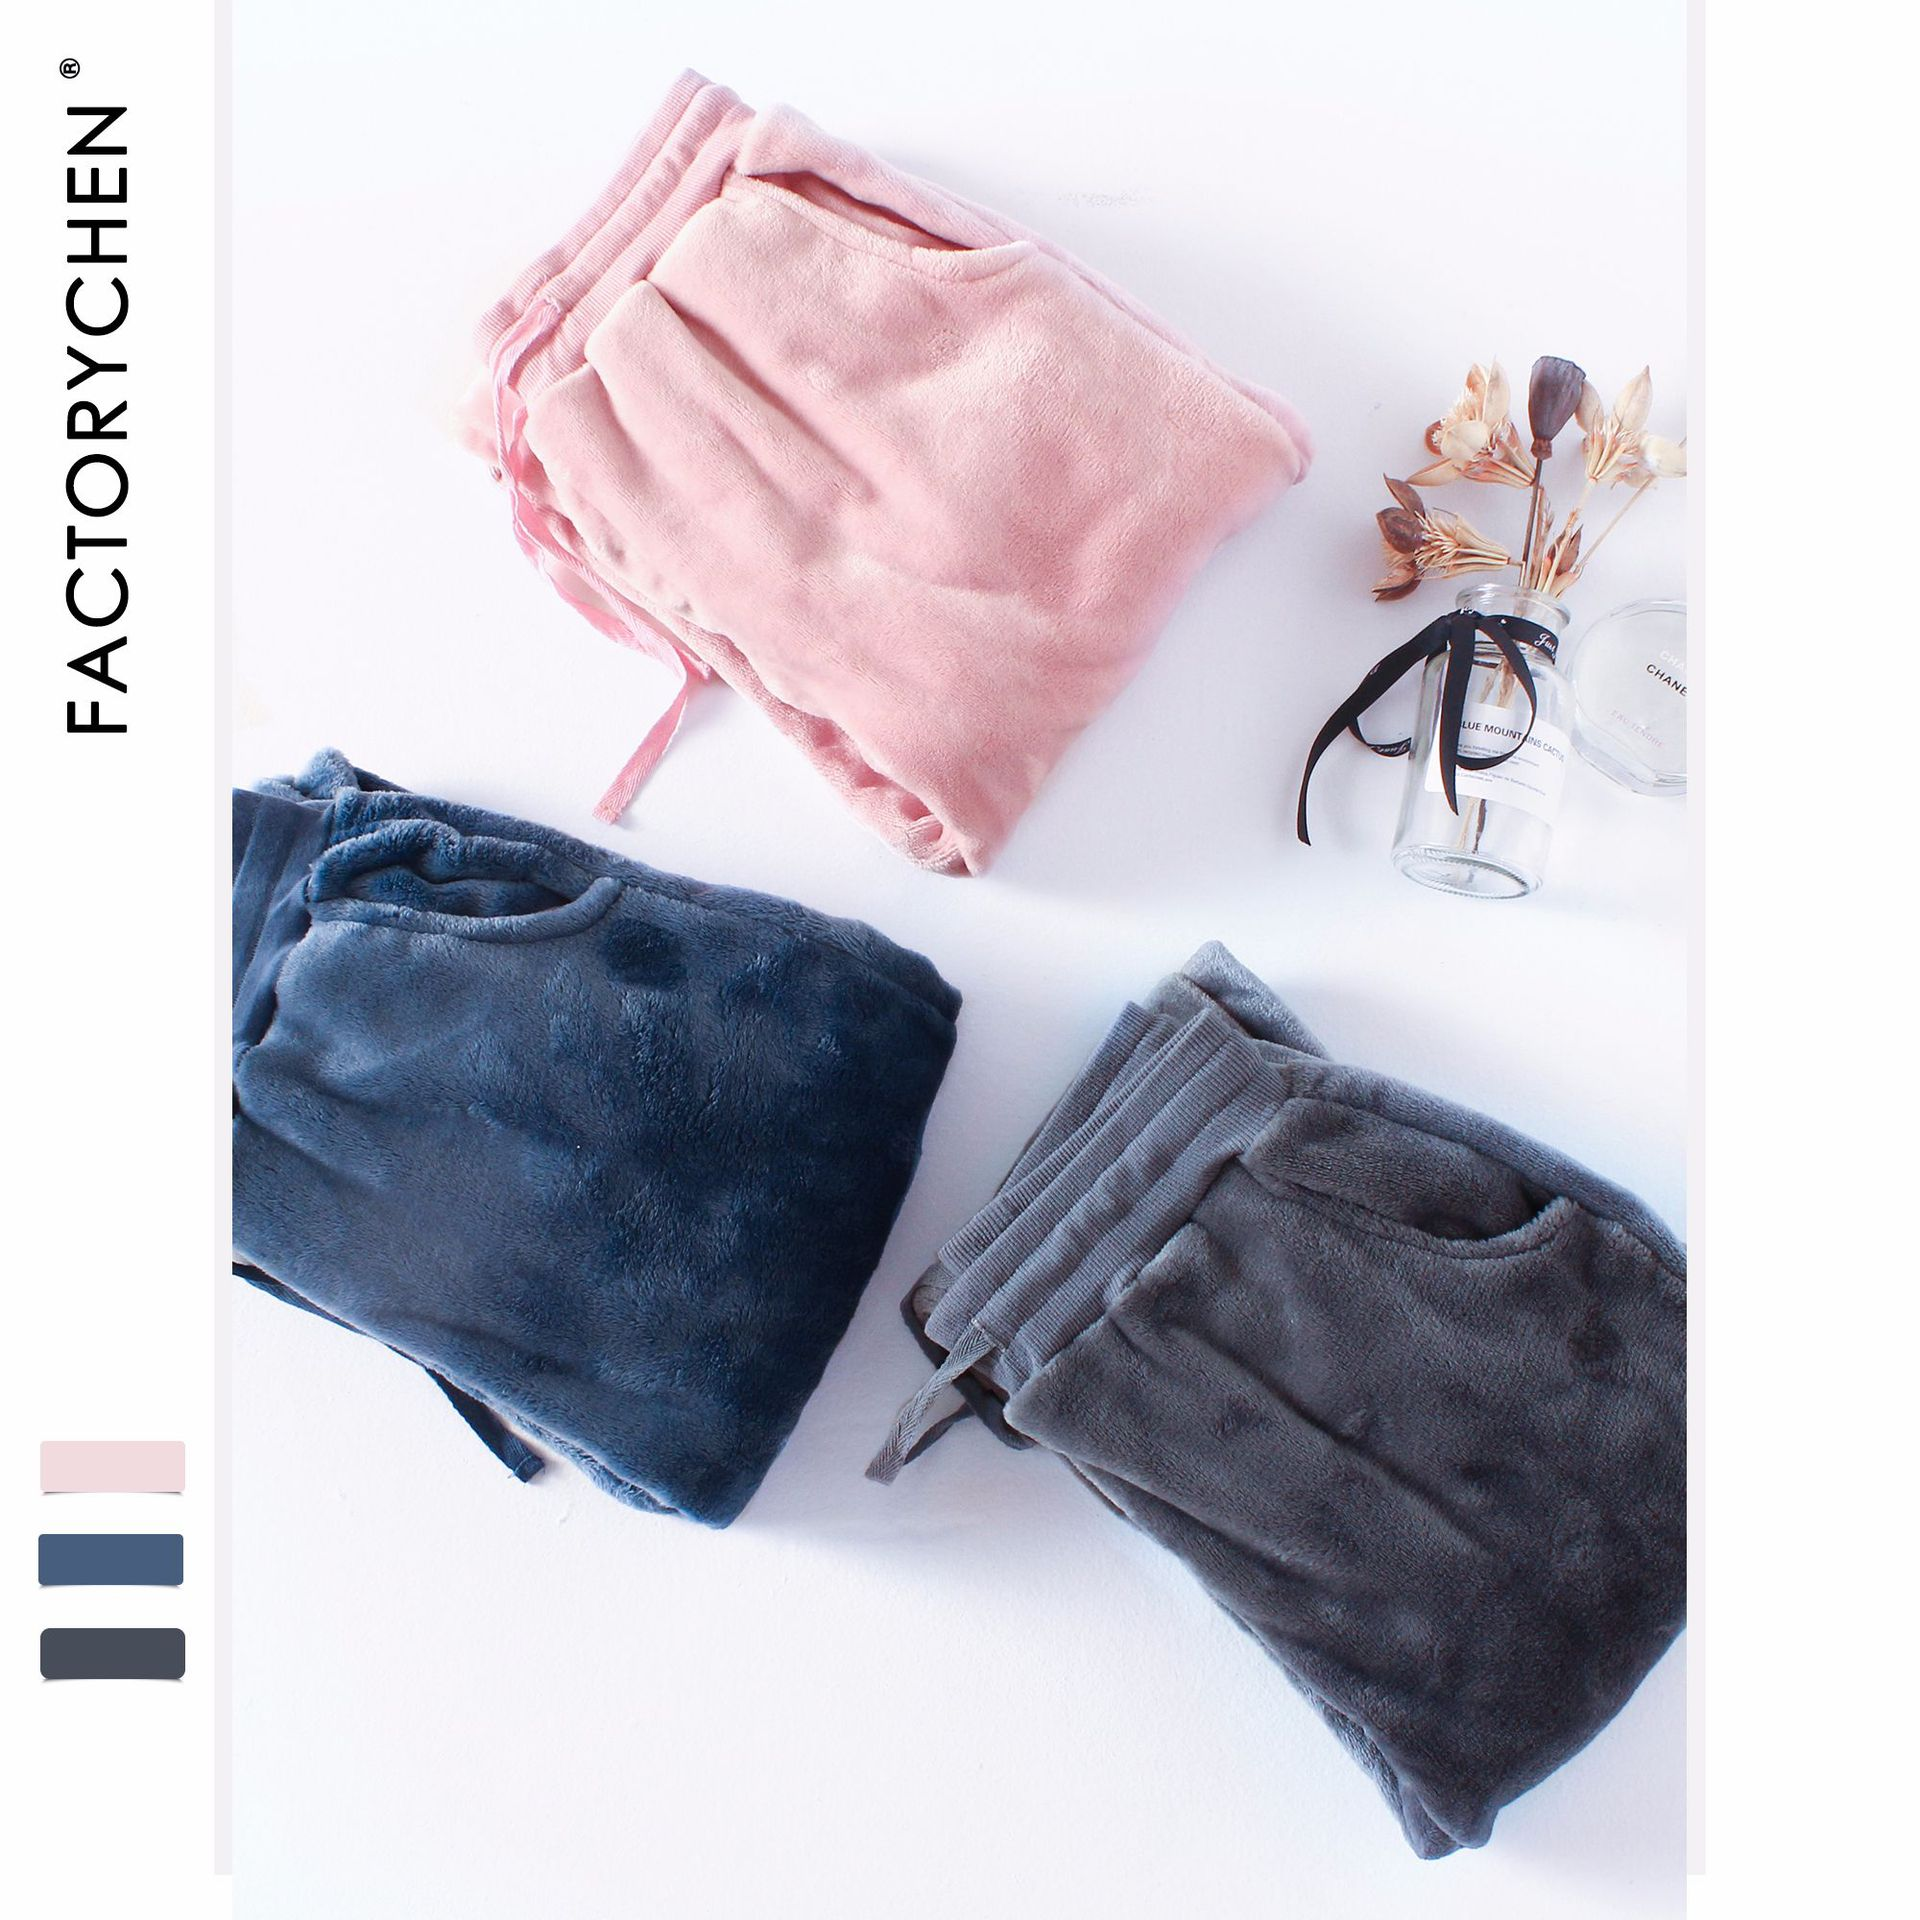 Autumn&winter Men&women Flannel Pijama Sleep Bottoms Couple Thickened Large Size Home Pants Plus Fertilizer Coral Fleece Pants